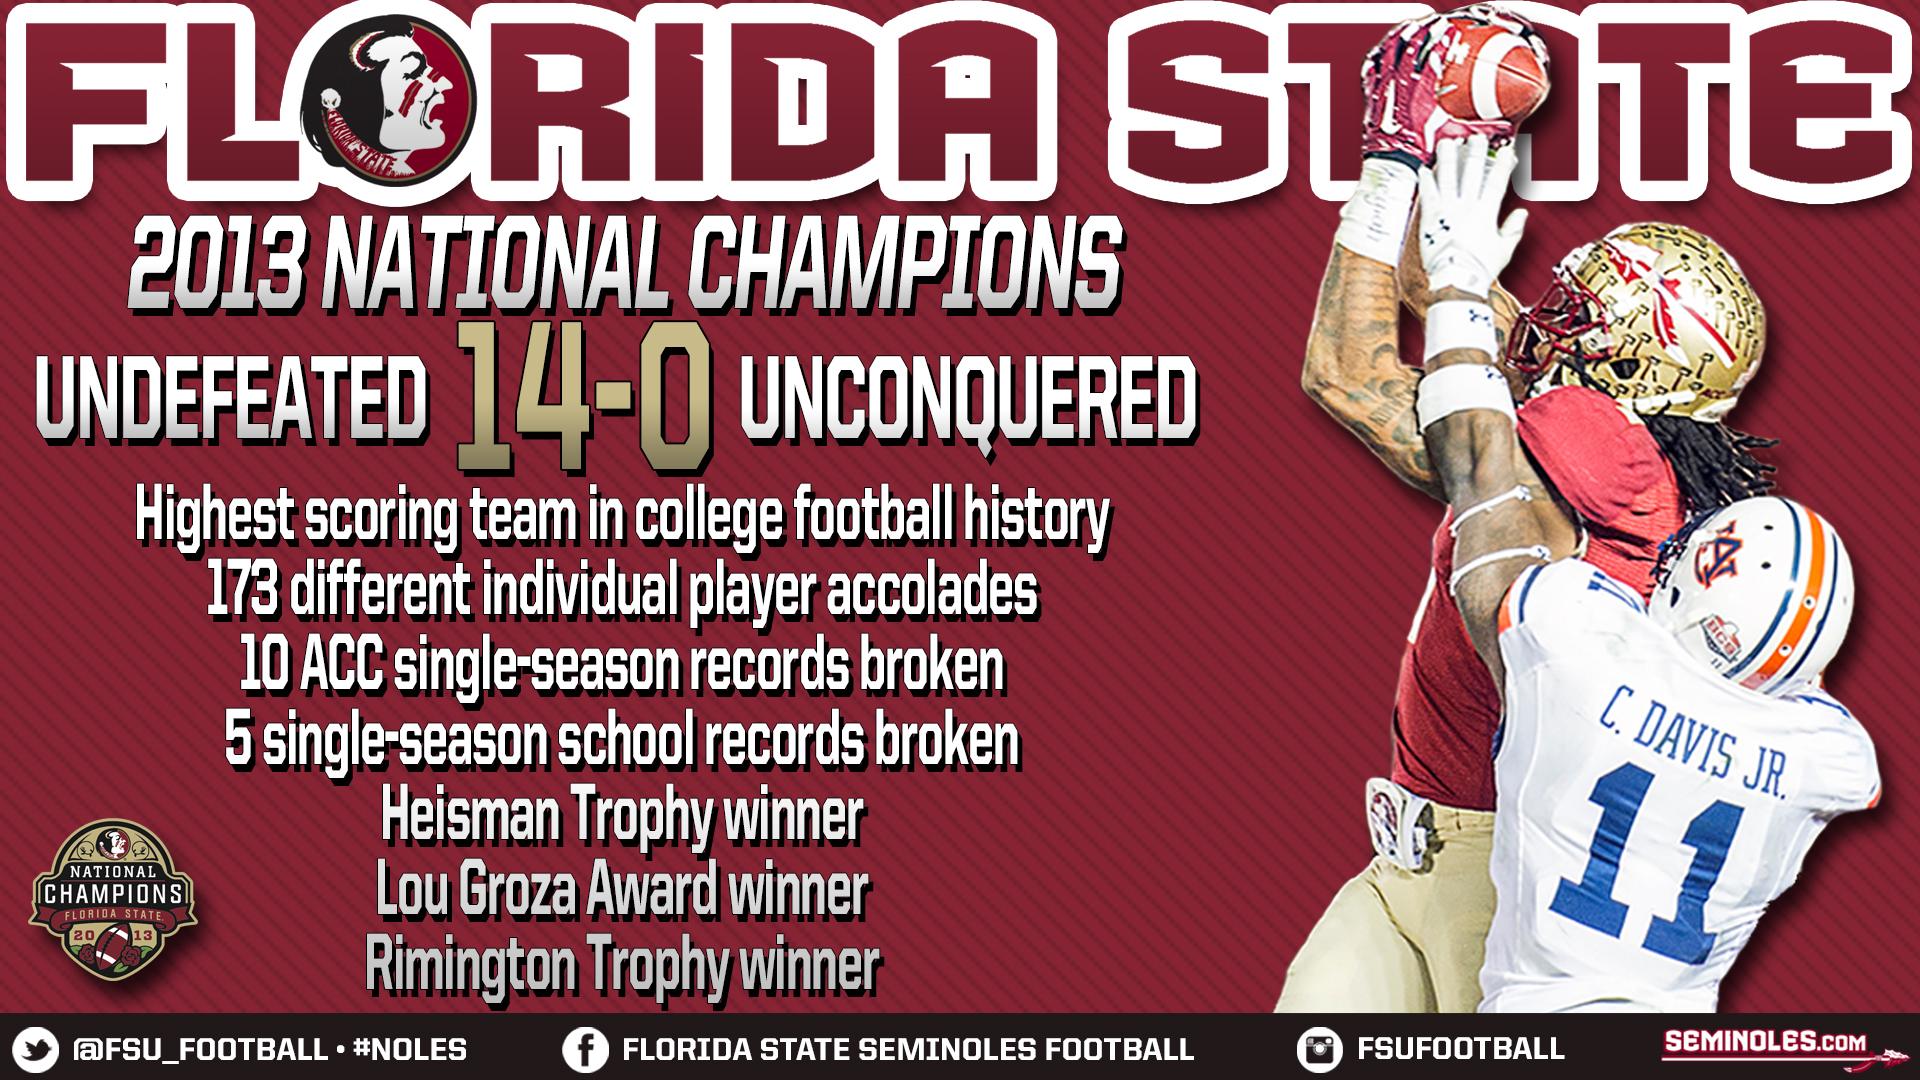 Florida State Seminoles Football 2013 Wallpaper Fsu football national 1920x1080